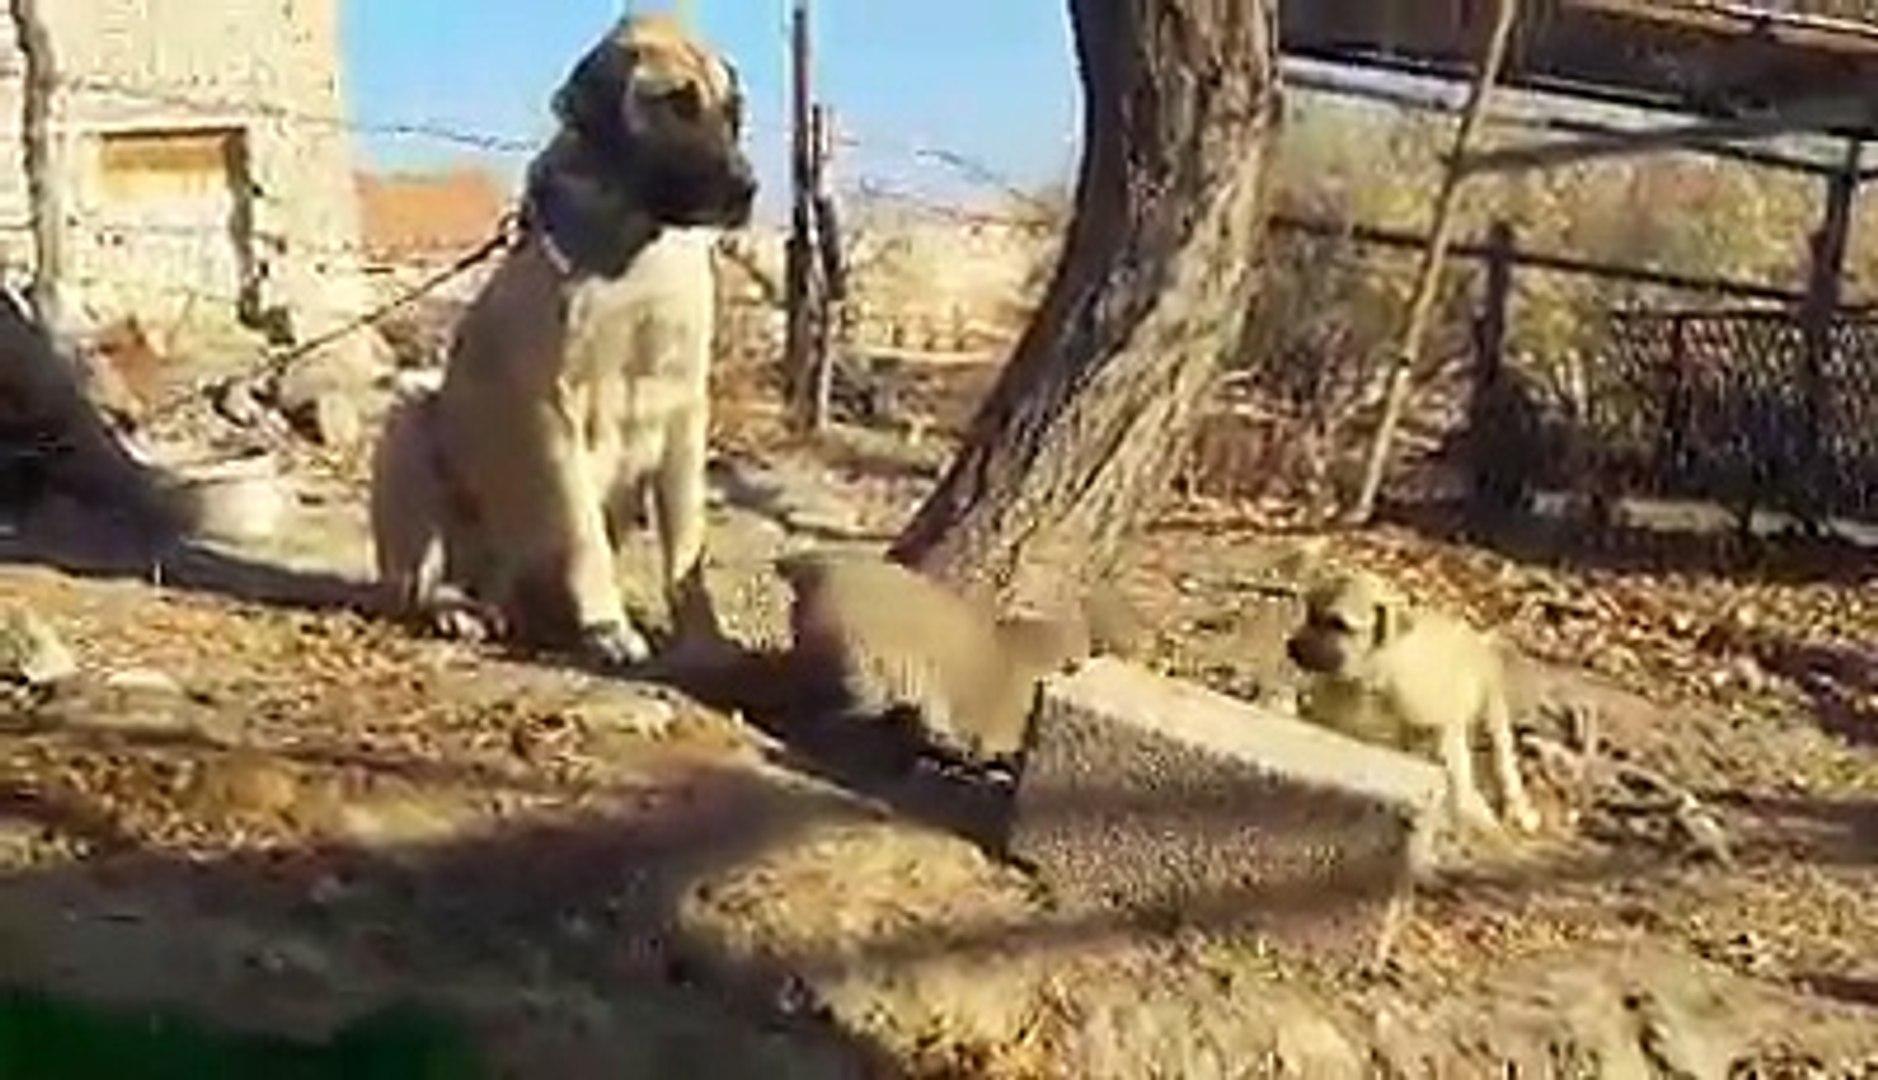 COK SiRiN ANADOLU COBAN KOPEK YAVRUSU - VERY CUTE ANATOLiAN SHEPHERD PUPPY DOG